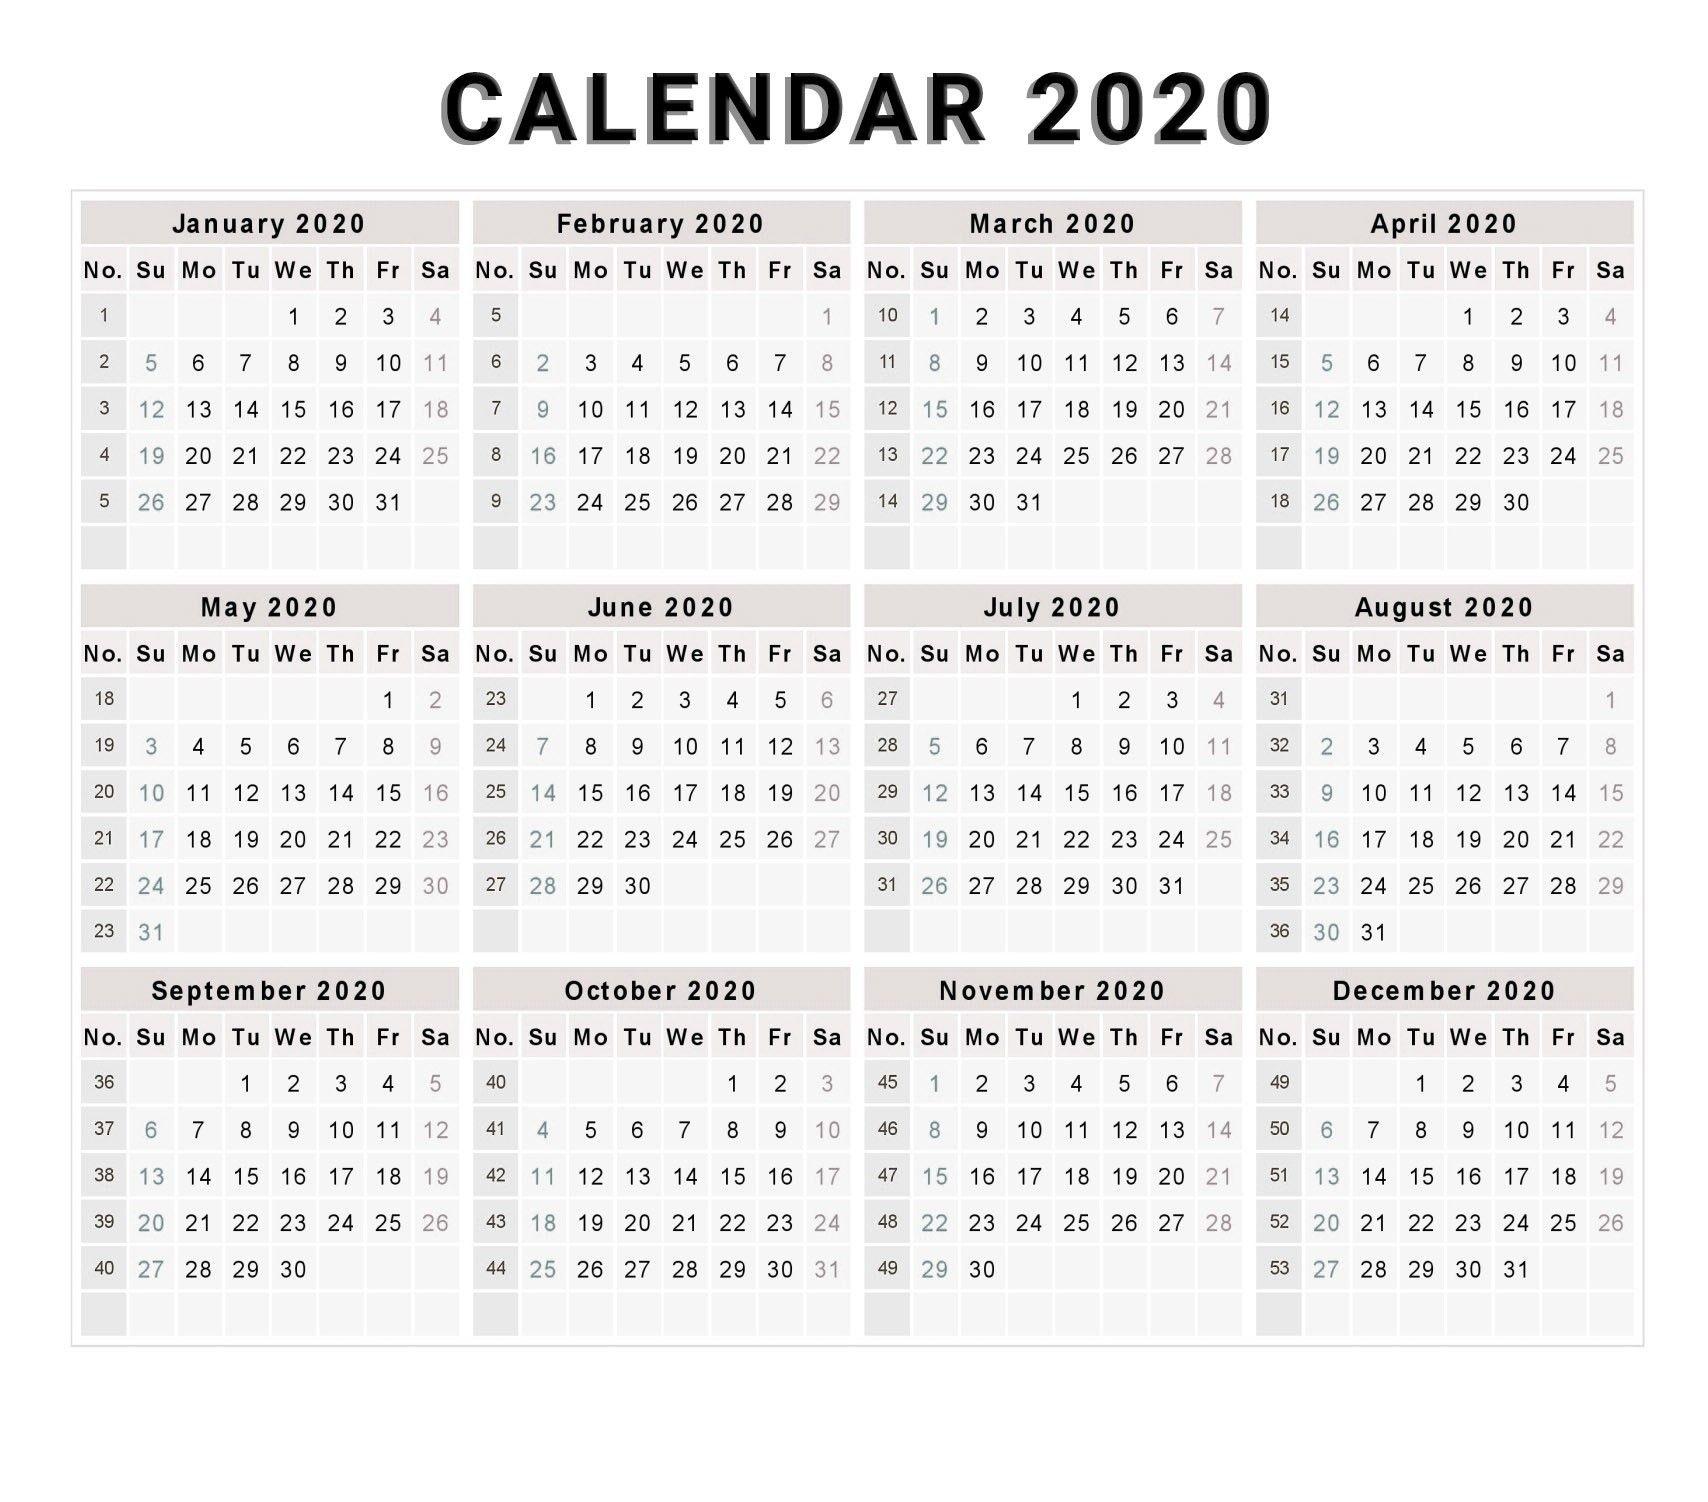 Calendar 2020 Free Printable Calendar 2020 Free 2020 within Download Free Printable 2020 Calendar